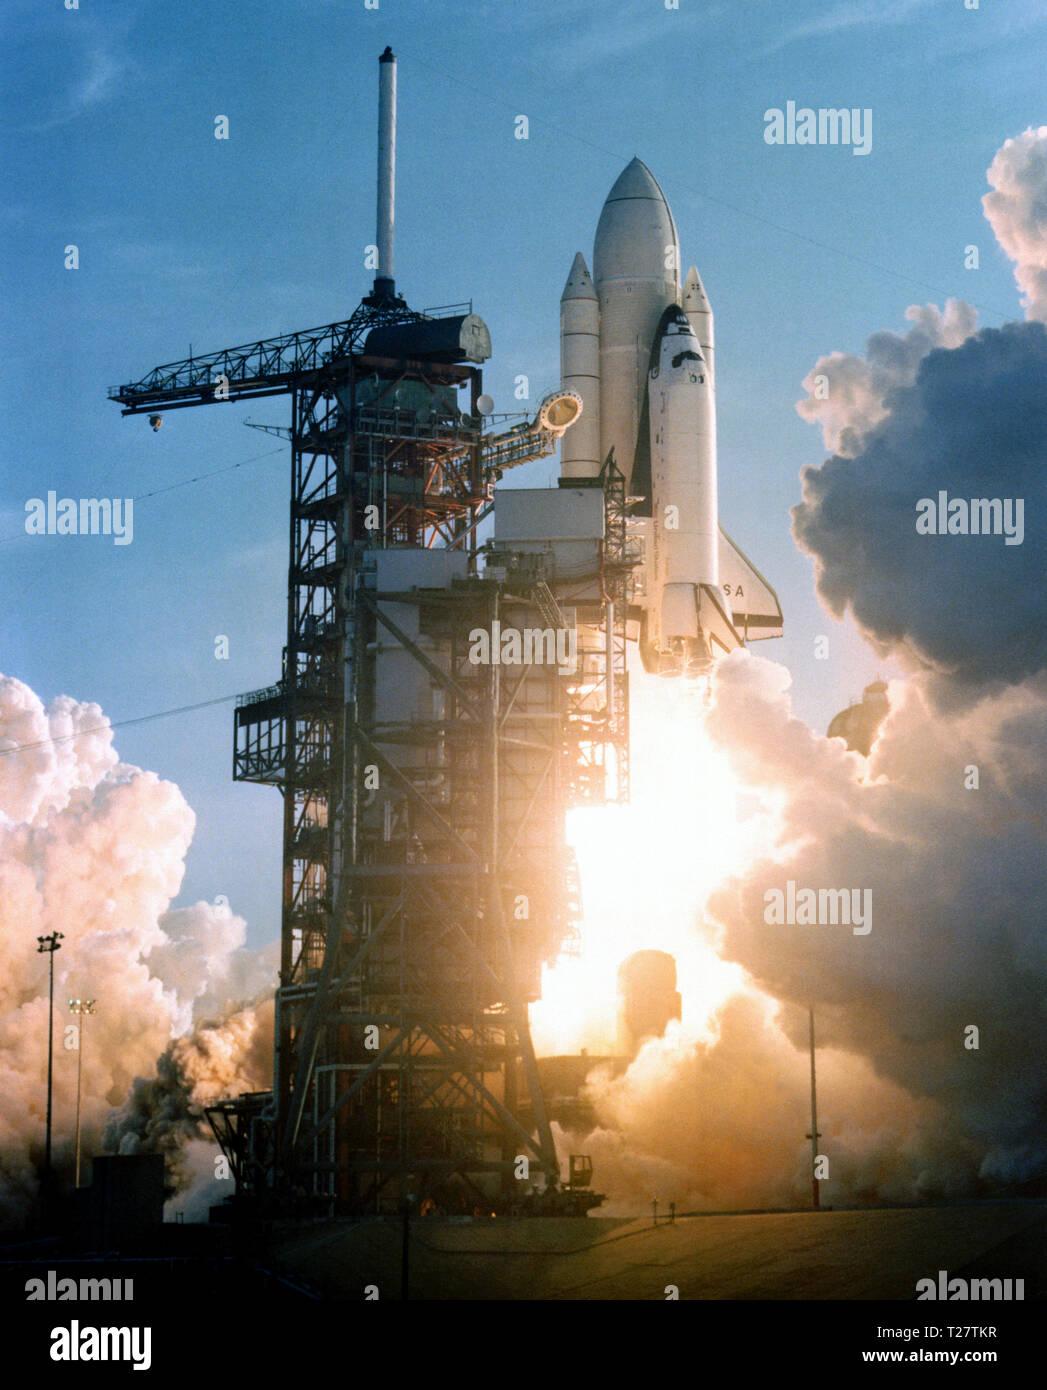 space shuttle columbia april 12 1981 - photo #19